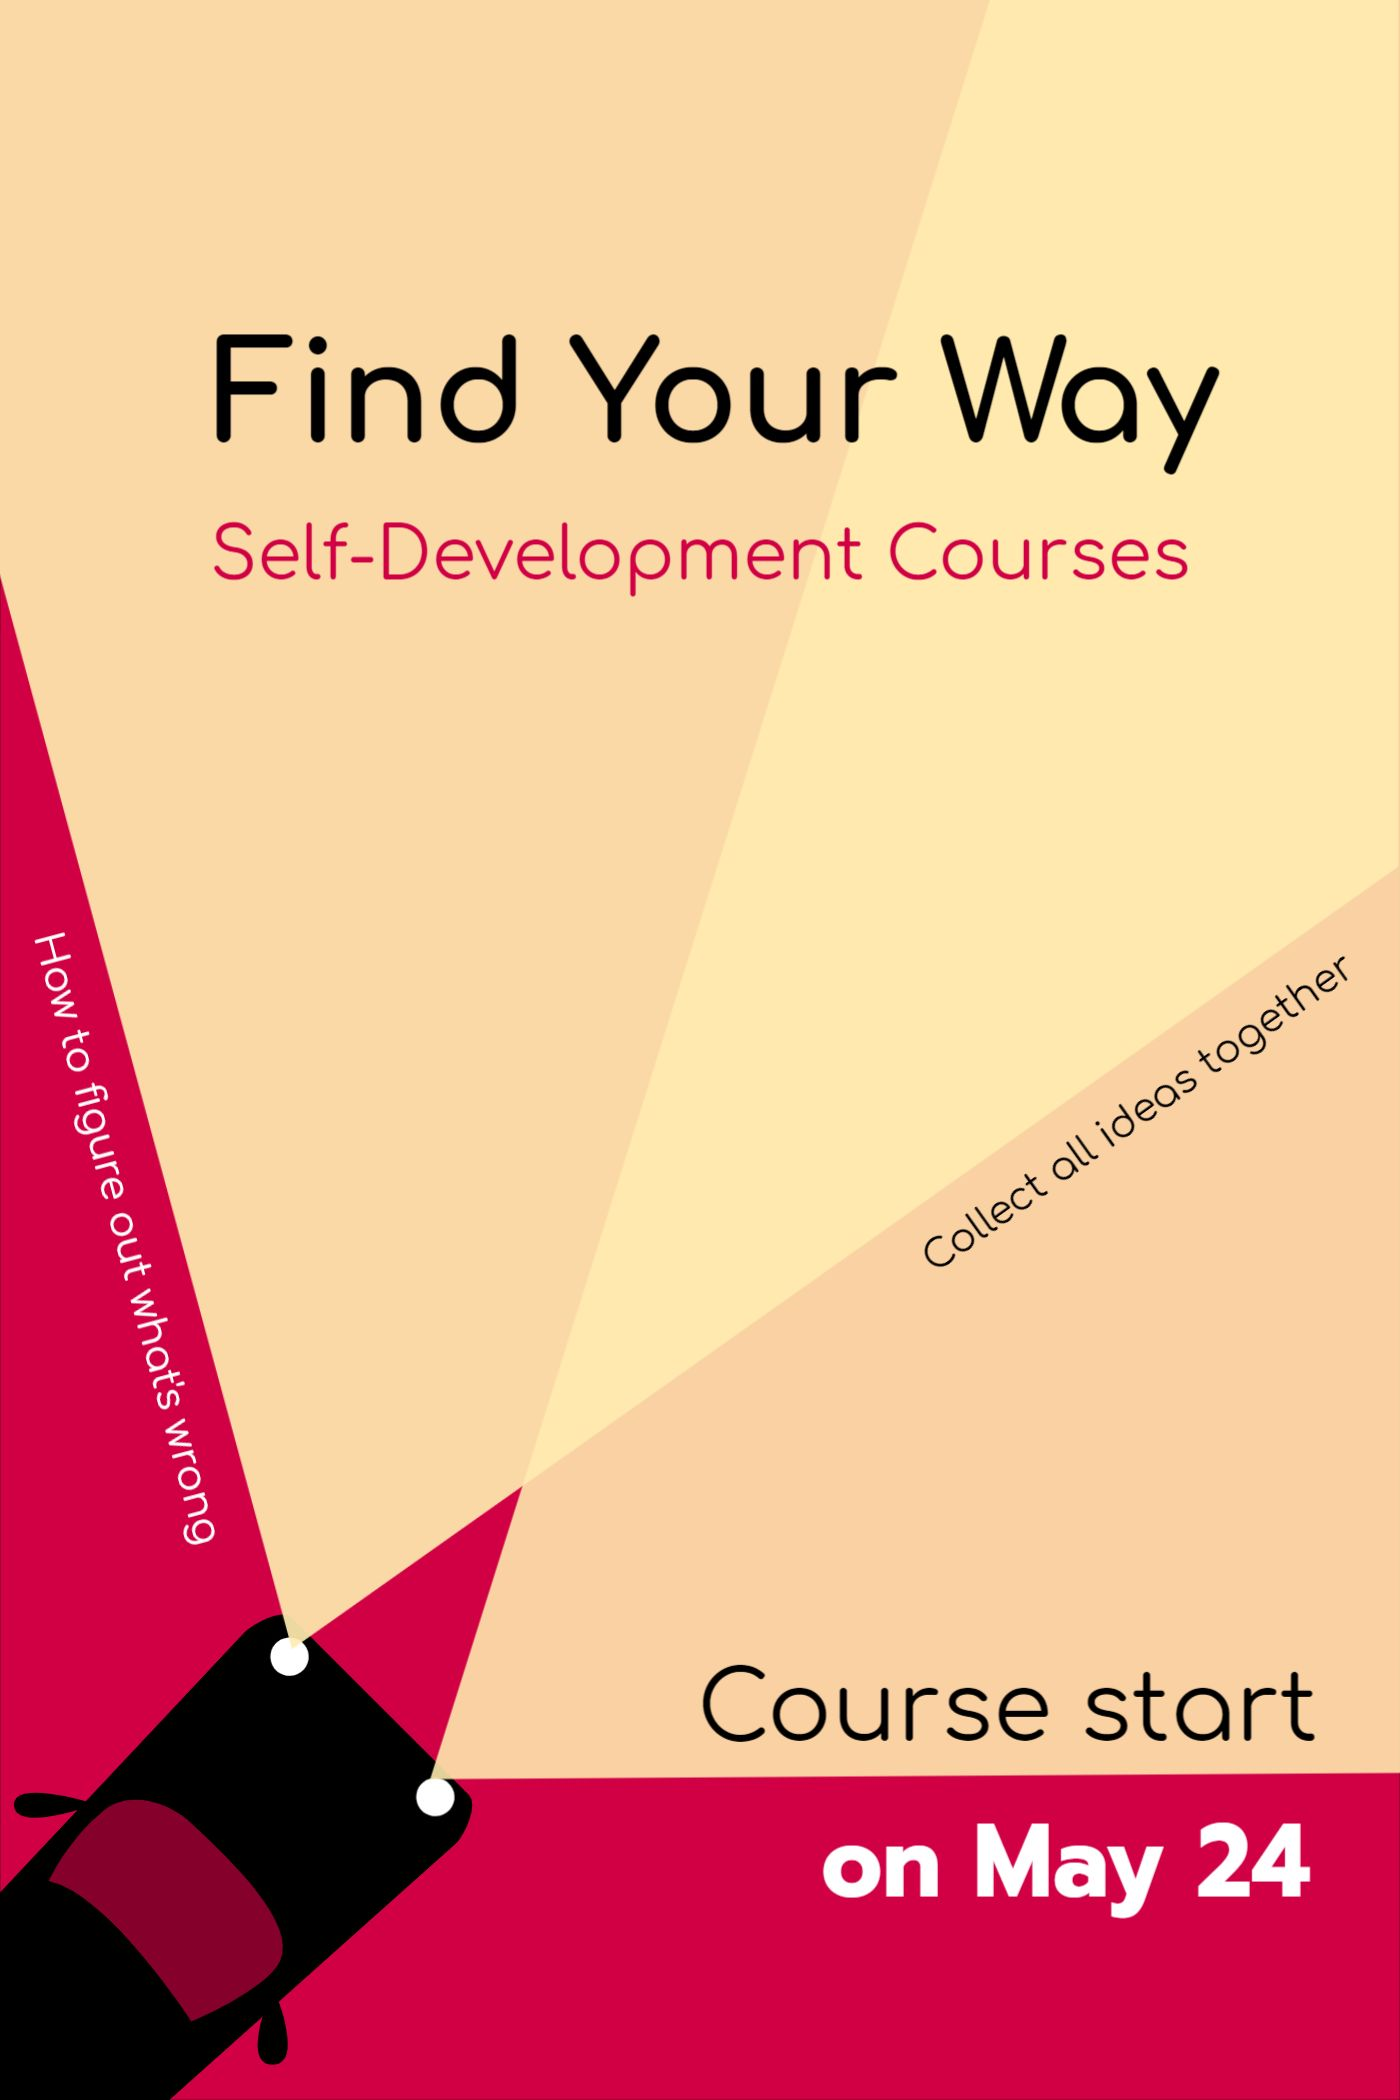 Self Bevelopment Course Cover Template